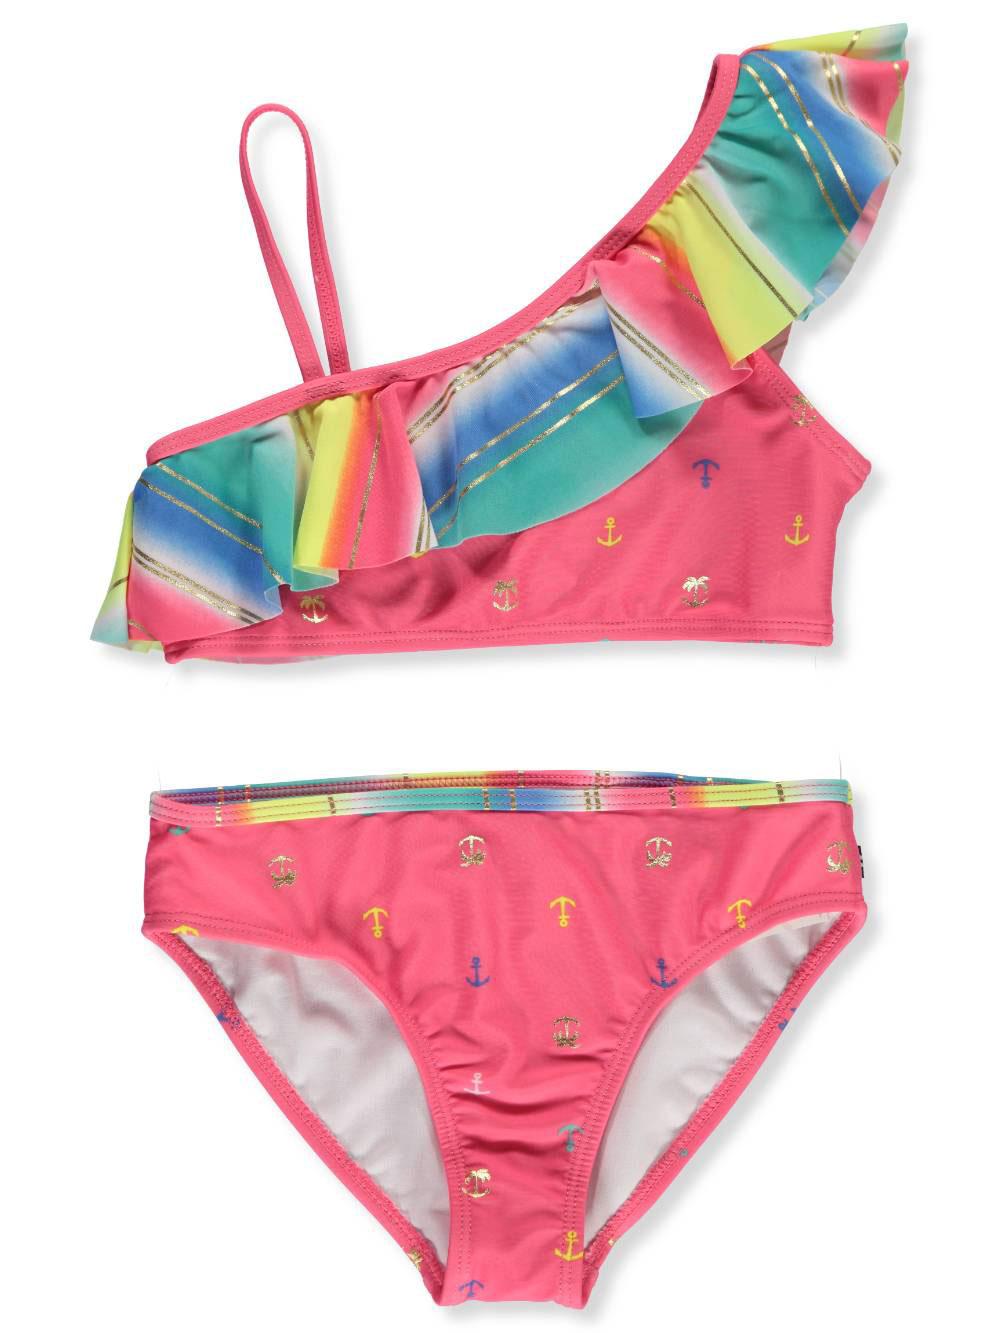 919962be41e Girls' 2-Piece Bikini by Nautica in Peach from Cookie's Kids